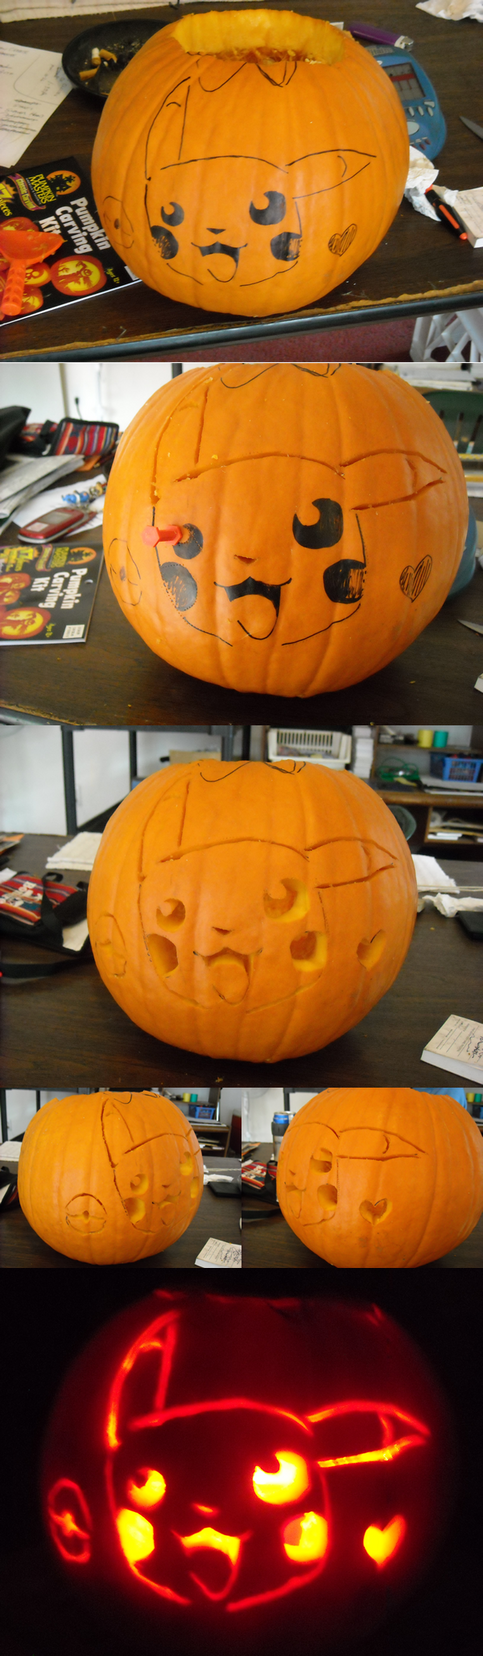 pokemon jack o lantern template - pikachu pumpkin by emotionlessblue on deviantart